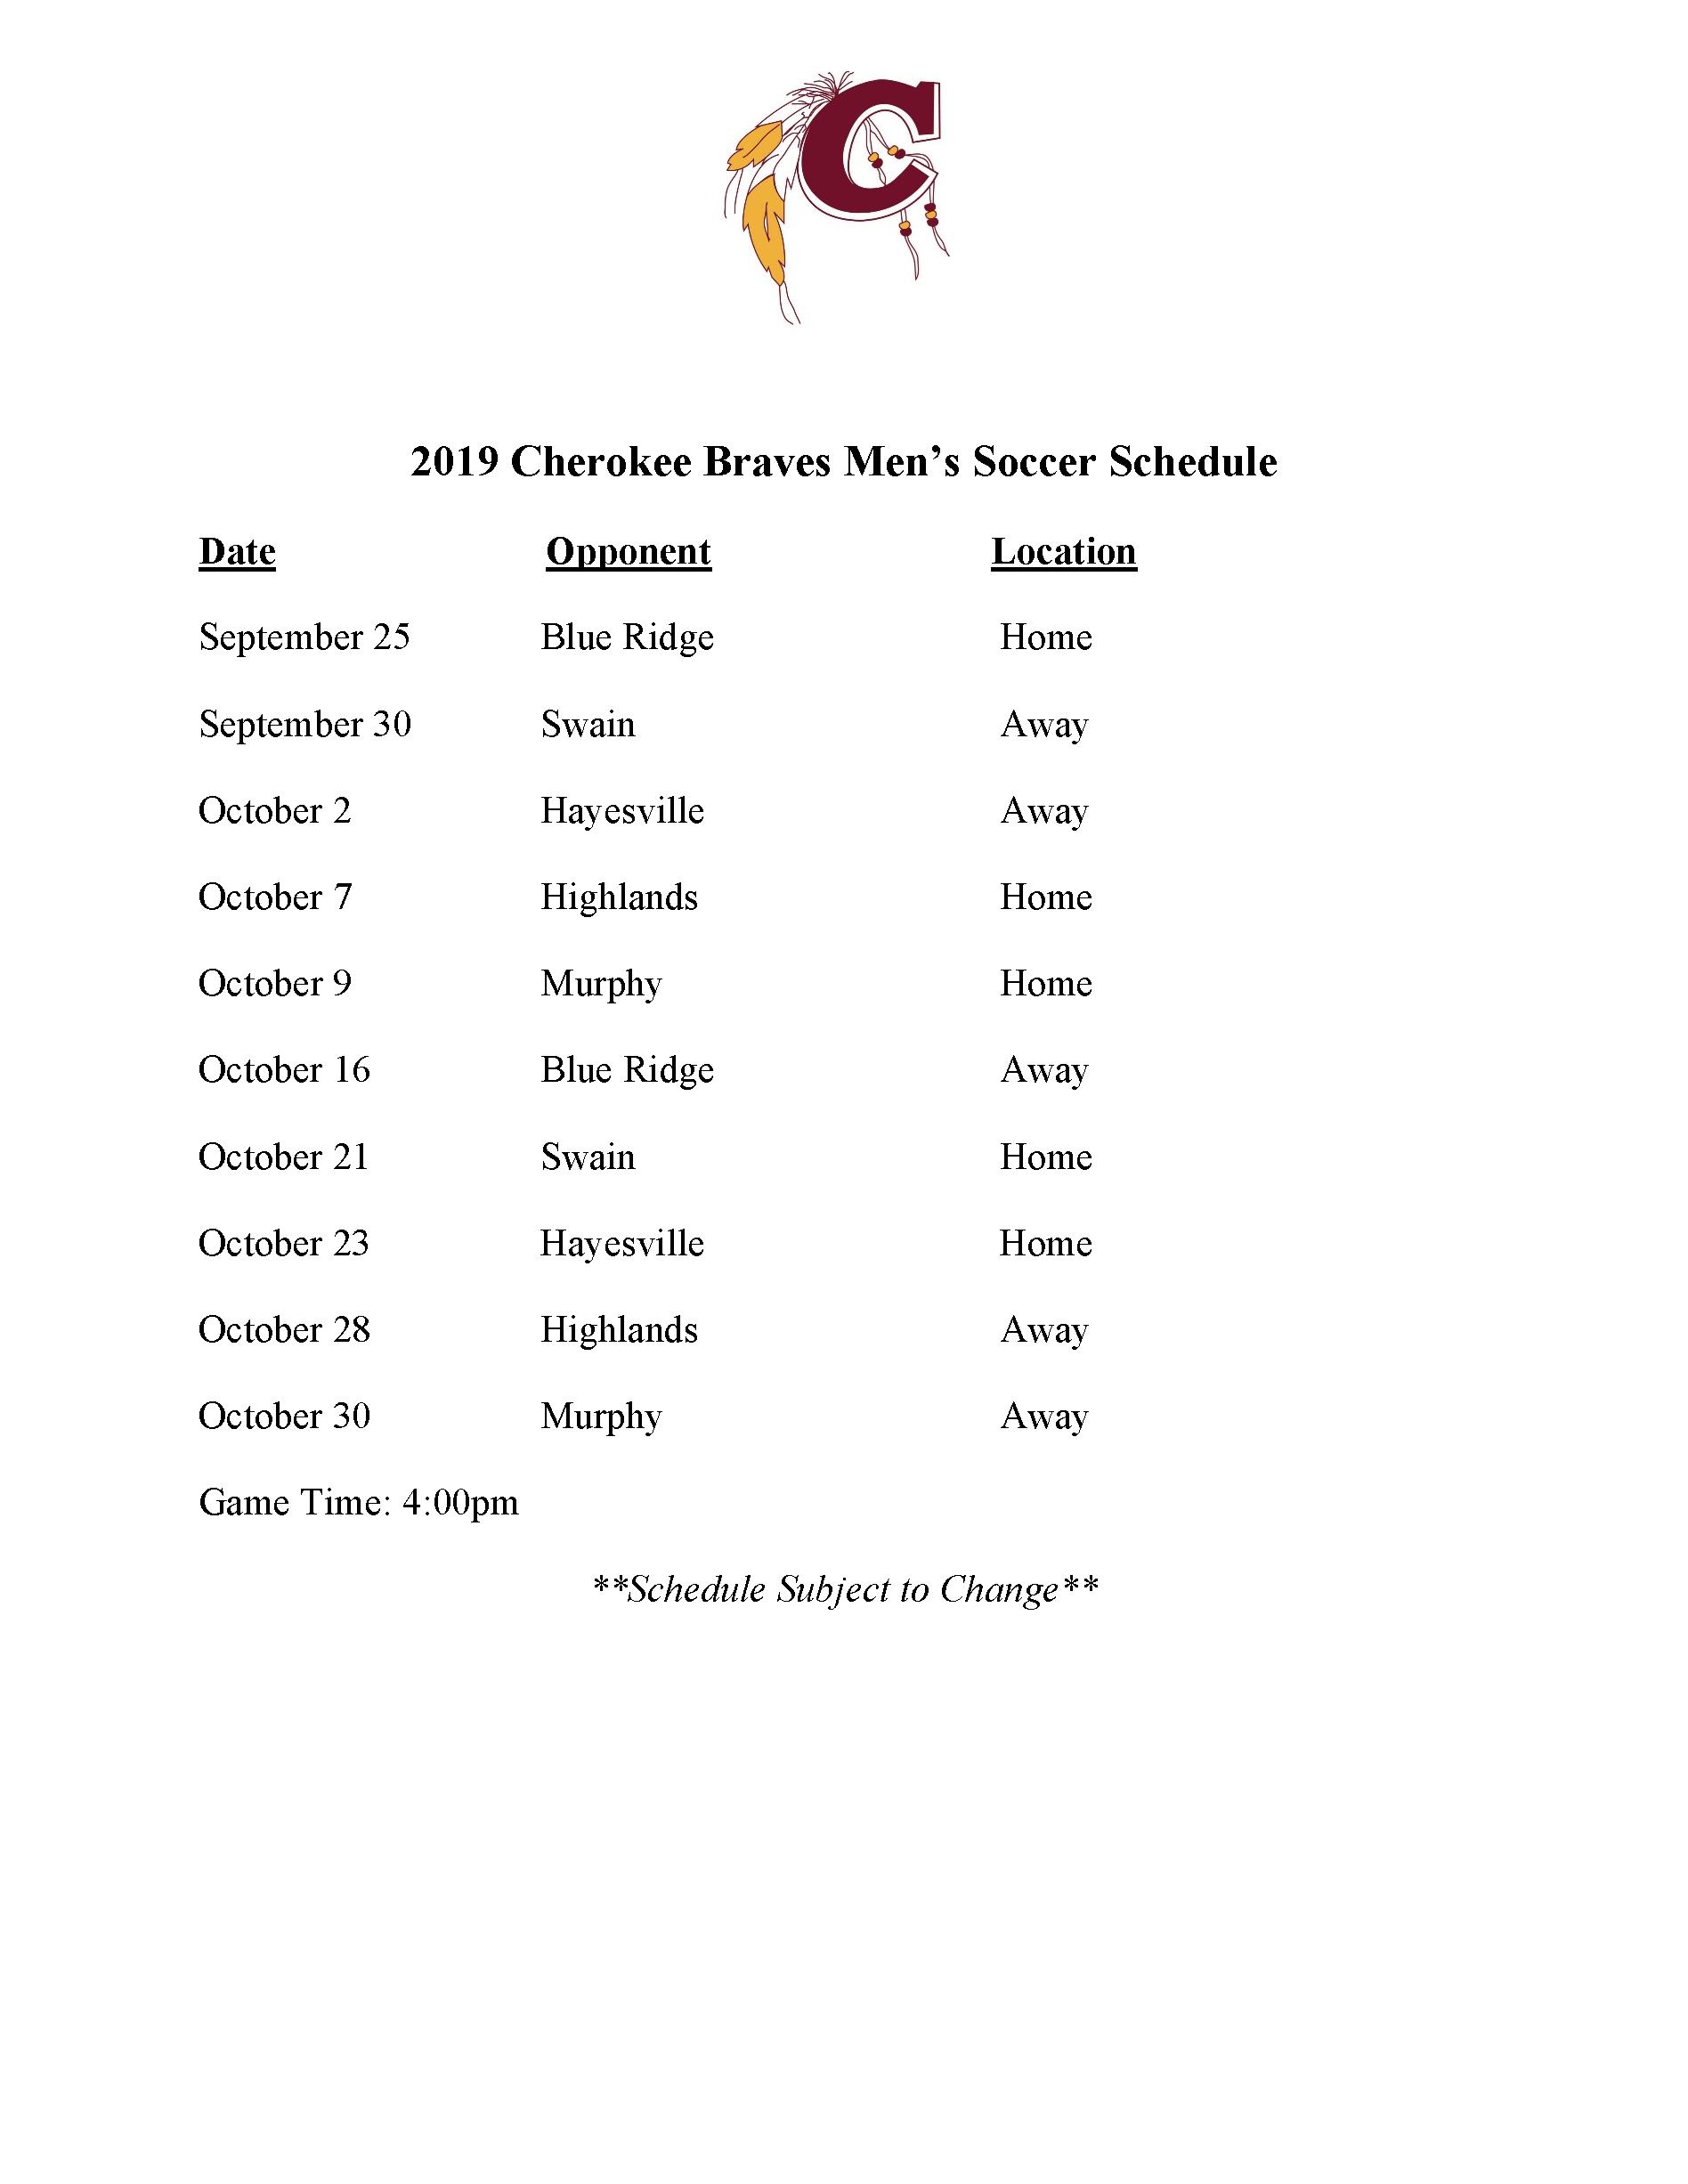 2019-2020 CHS Mens Soccer Schedule